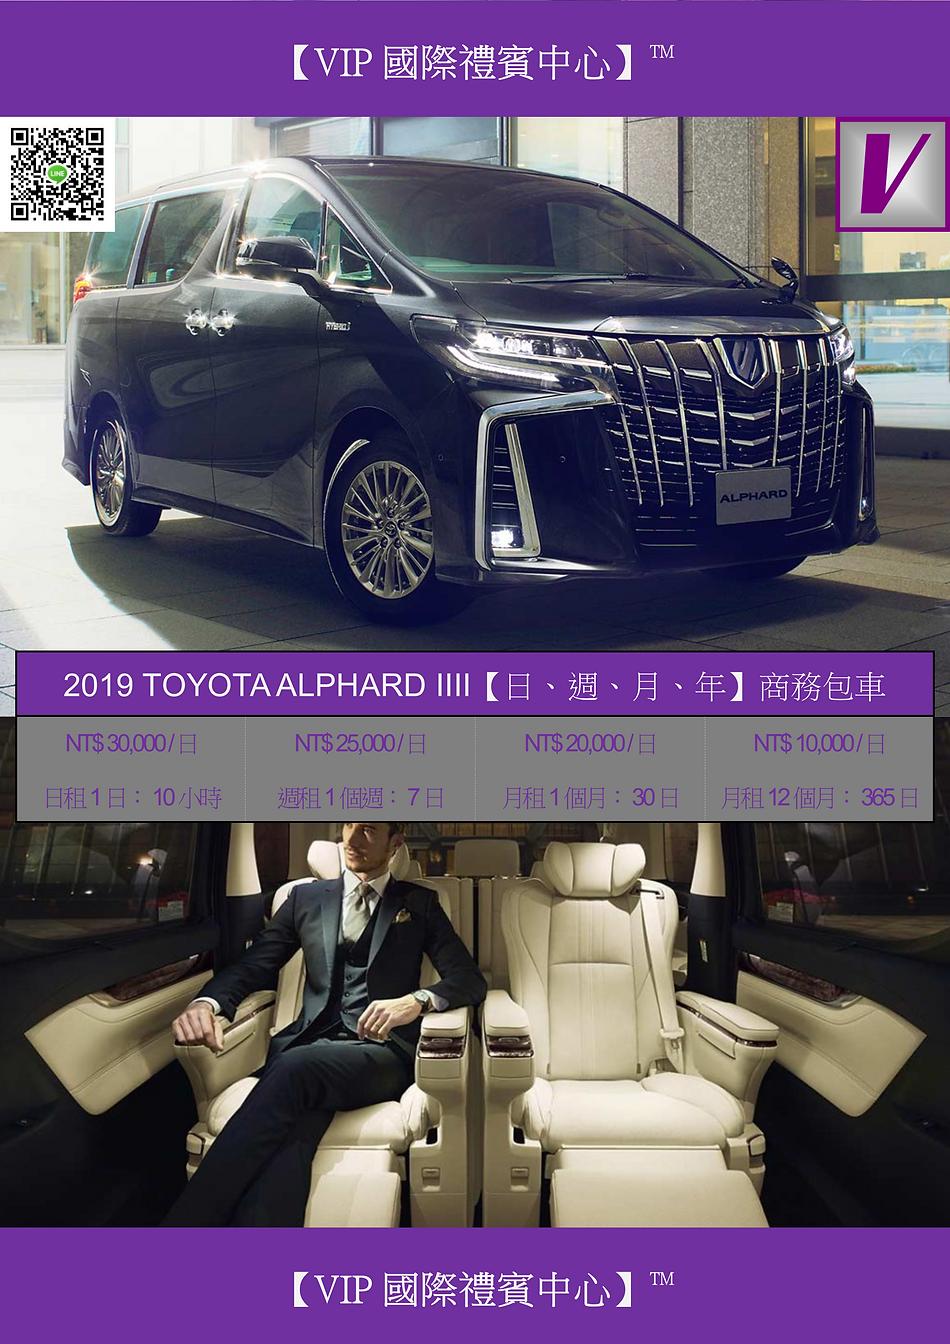 VIP國際禮賓中心 2019 TOYOTA ALPHARD IIII DM.pn